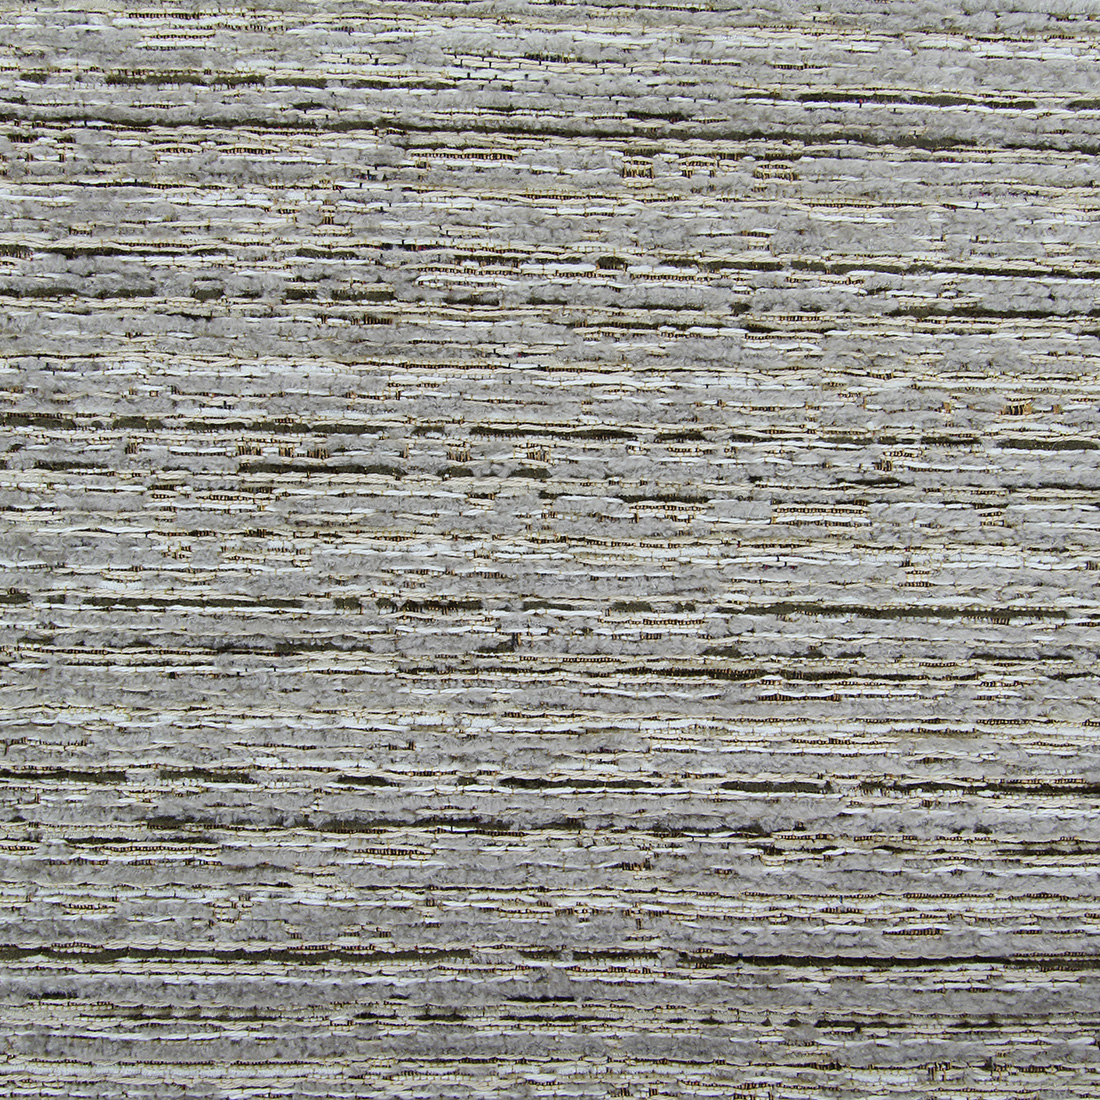 Vloerkleed Brinker Bolzano Beige | 240 x 340 cm